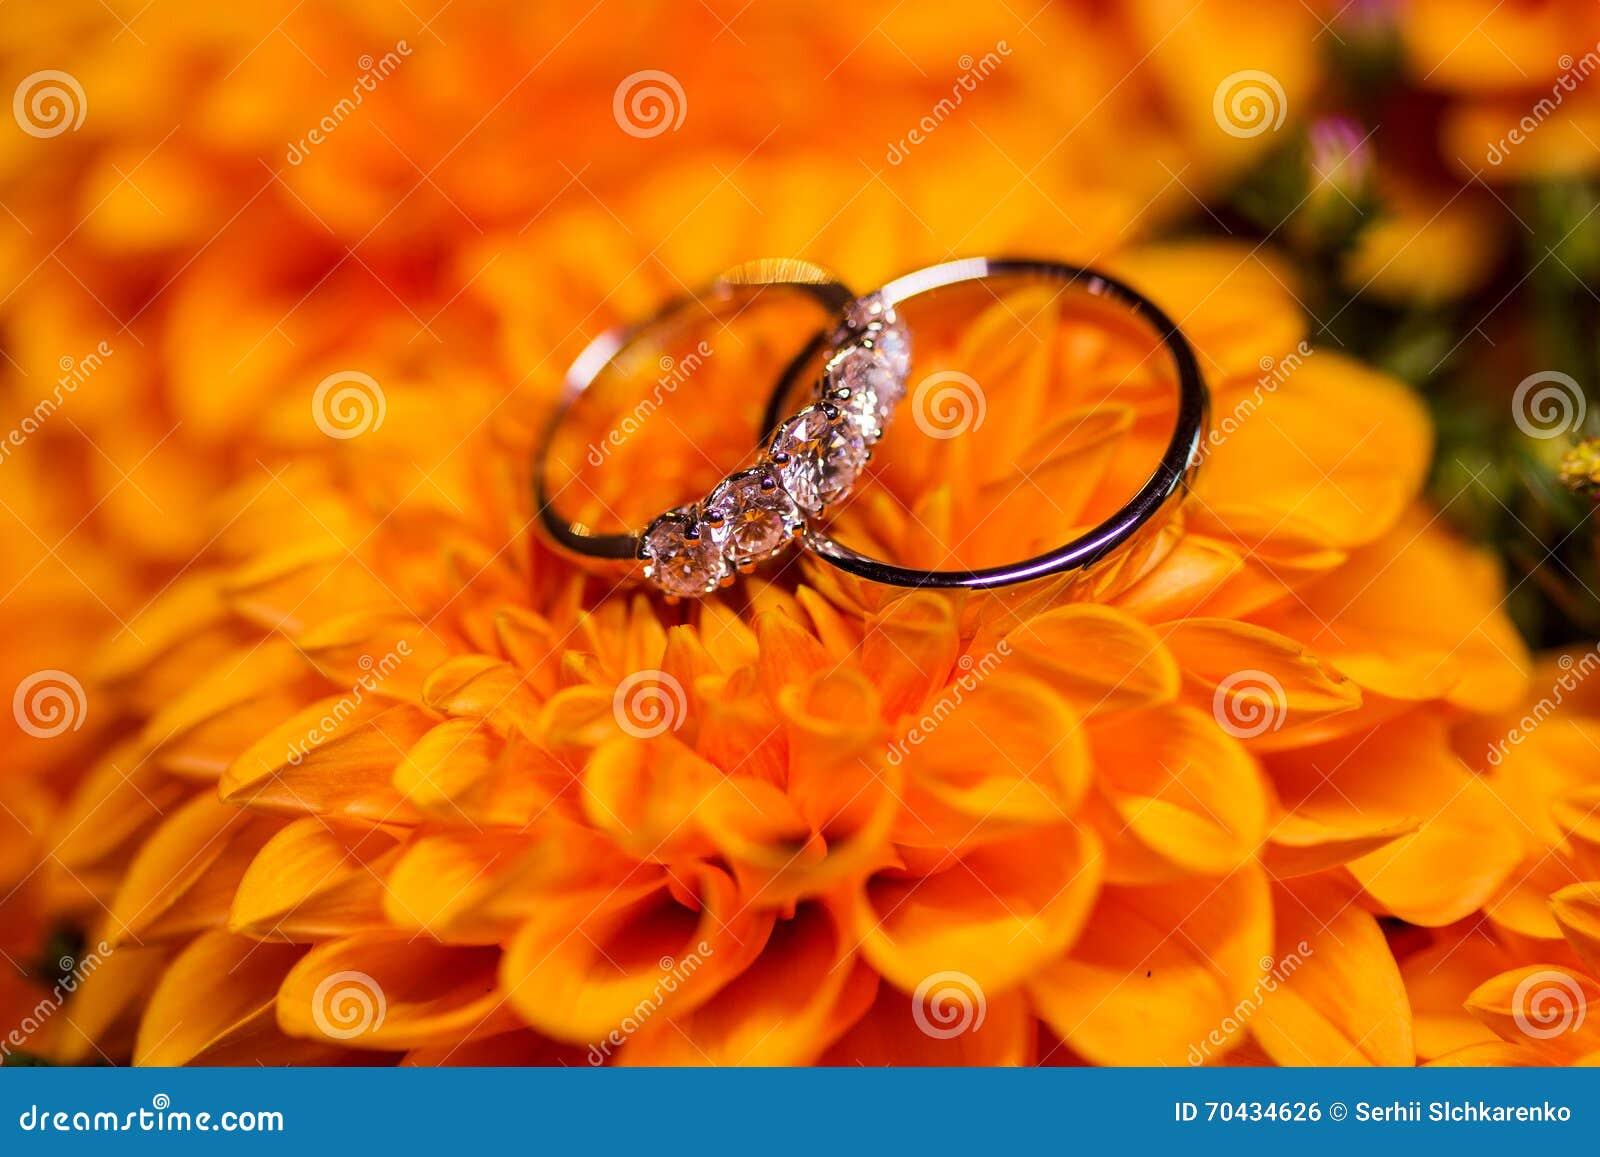 stock photo beautiful golden wedding rings diamonds orange flowers image orange wedding rings Beautiful golden wedding rings with diamonds on the orange flowers